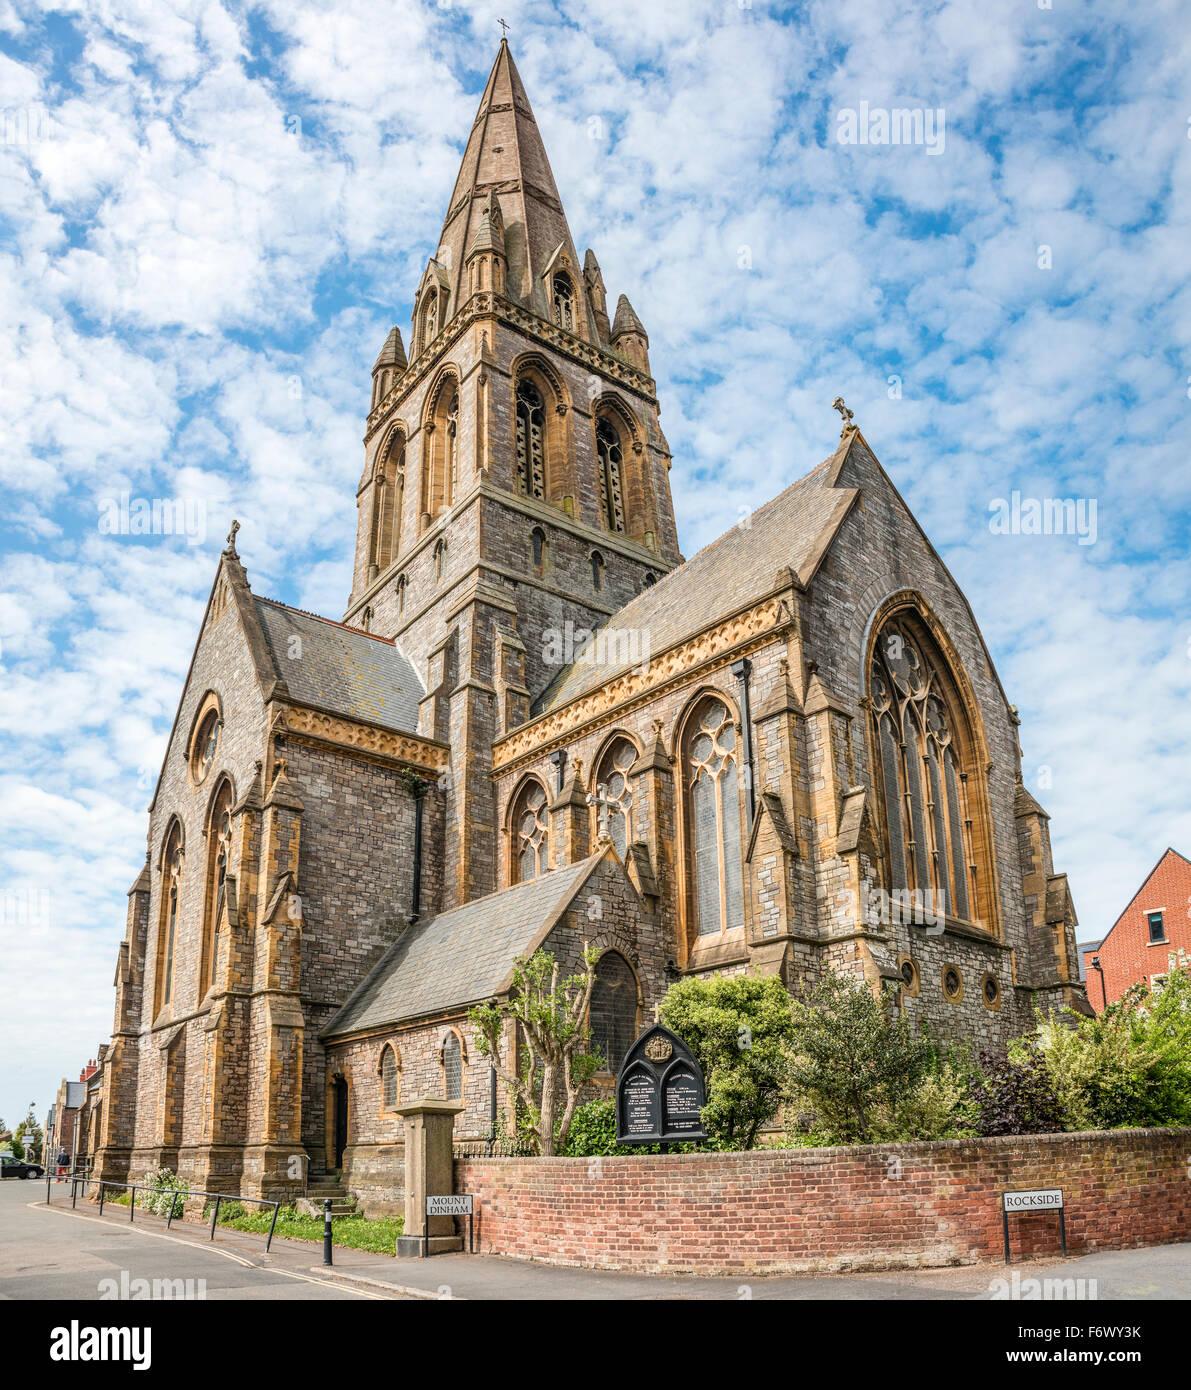 St. Michael und alle Engel Kirche auf Mount Dinham, Exeter, Devon, UK Stockbild